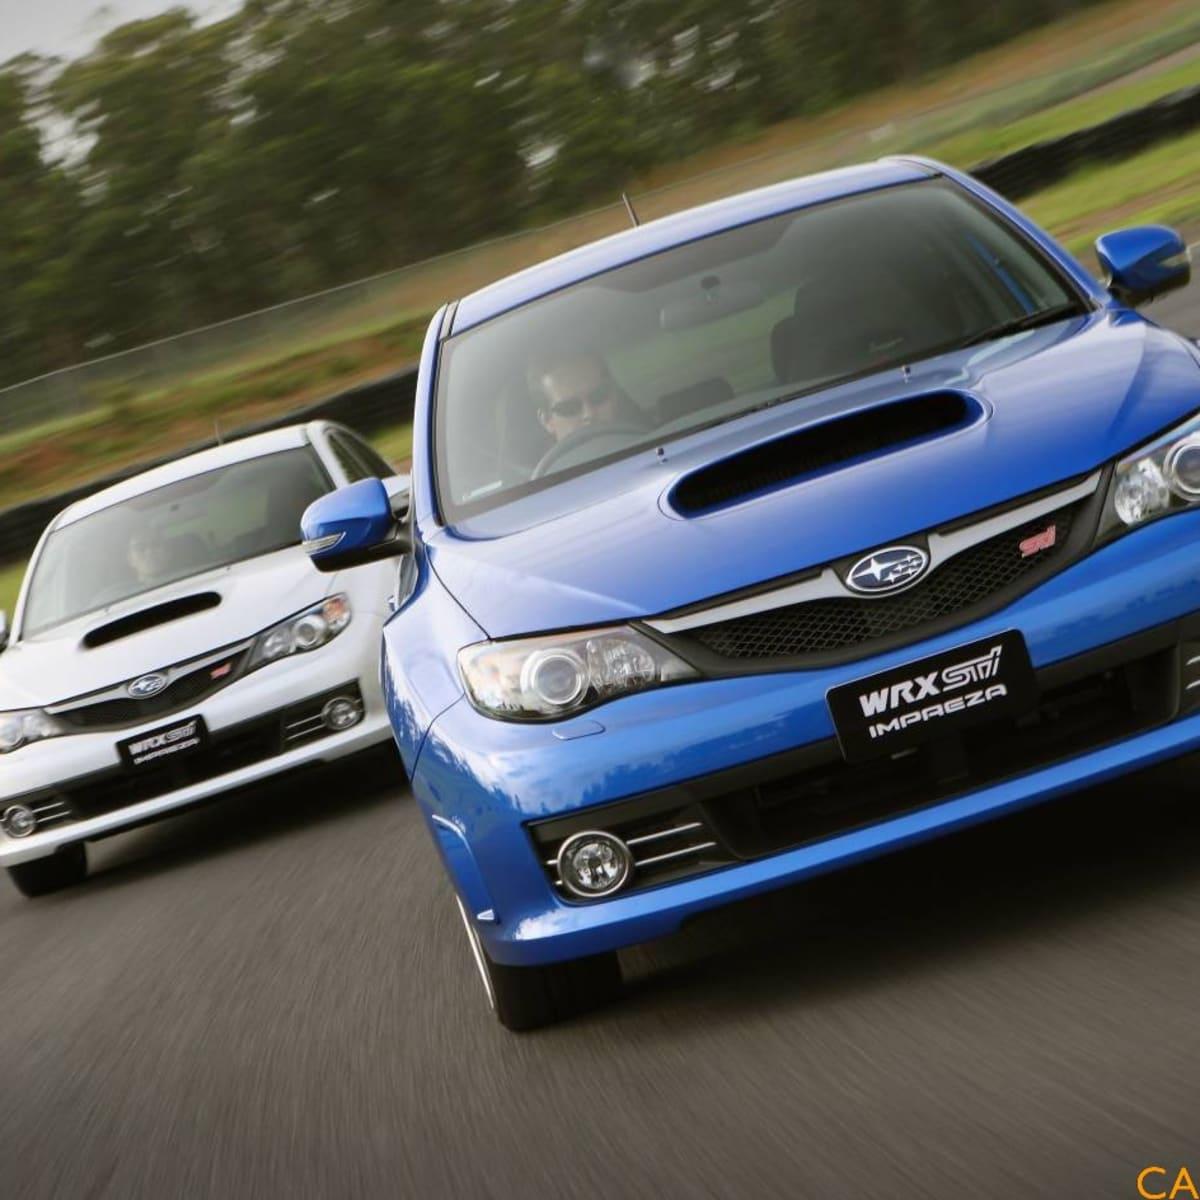 2008 Subaru Impreza WRX STi | CarAdvice